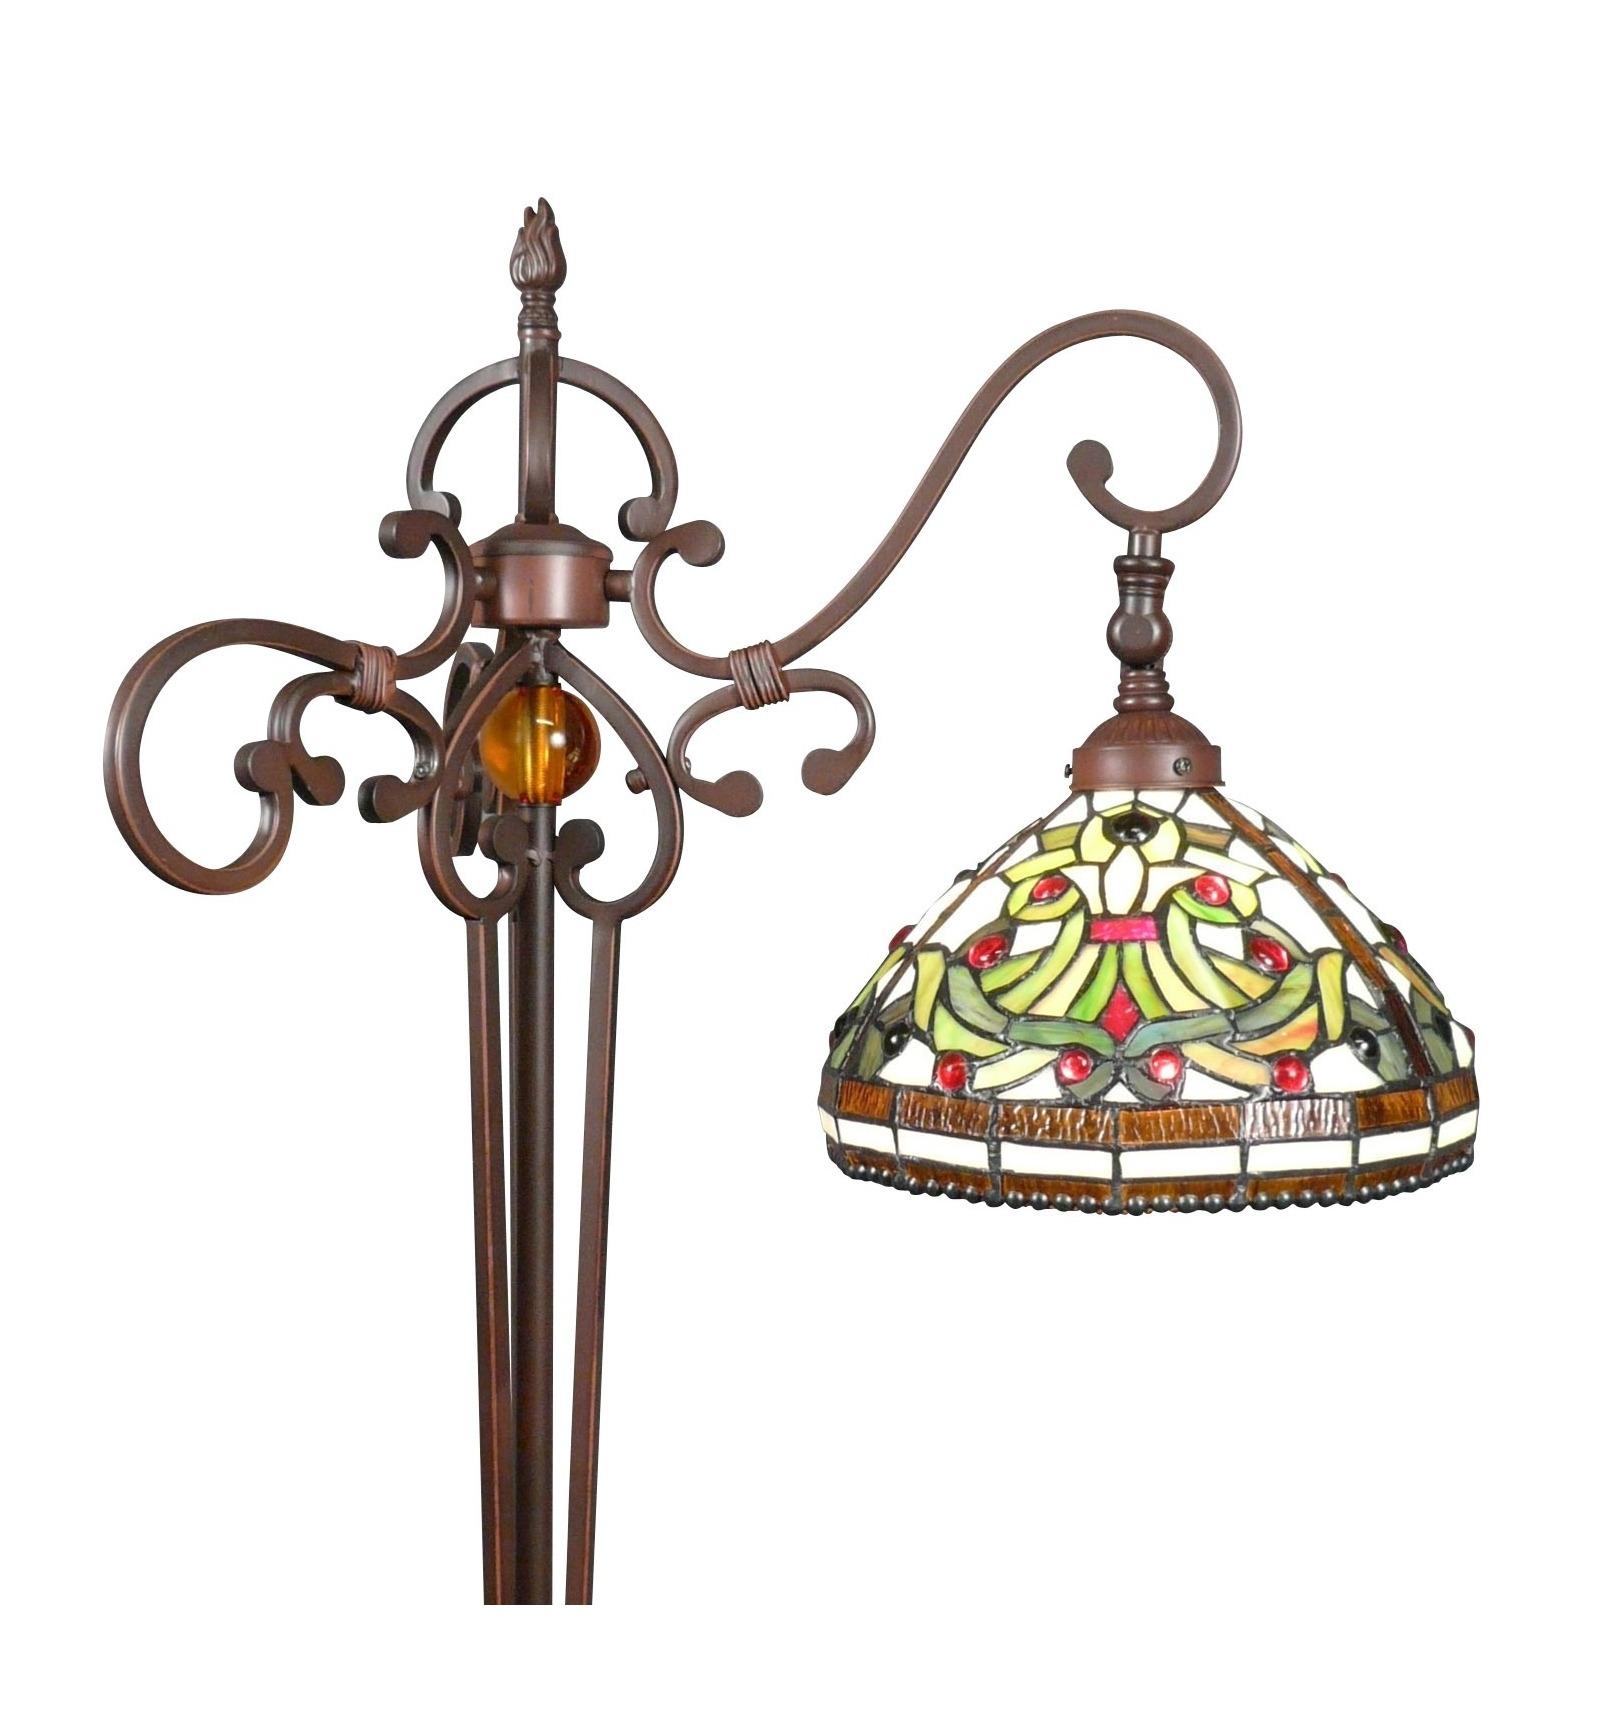 lampe de sol sur pied style Tiffany